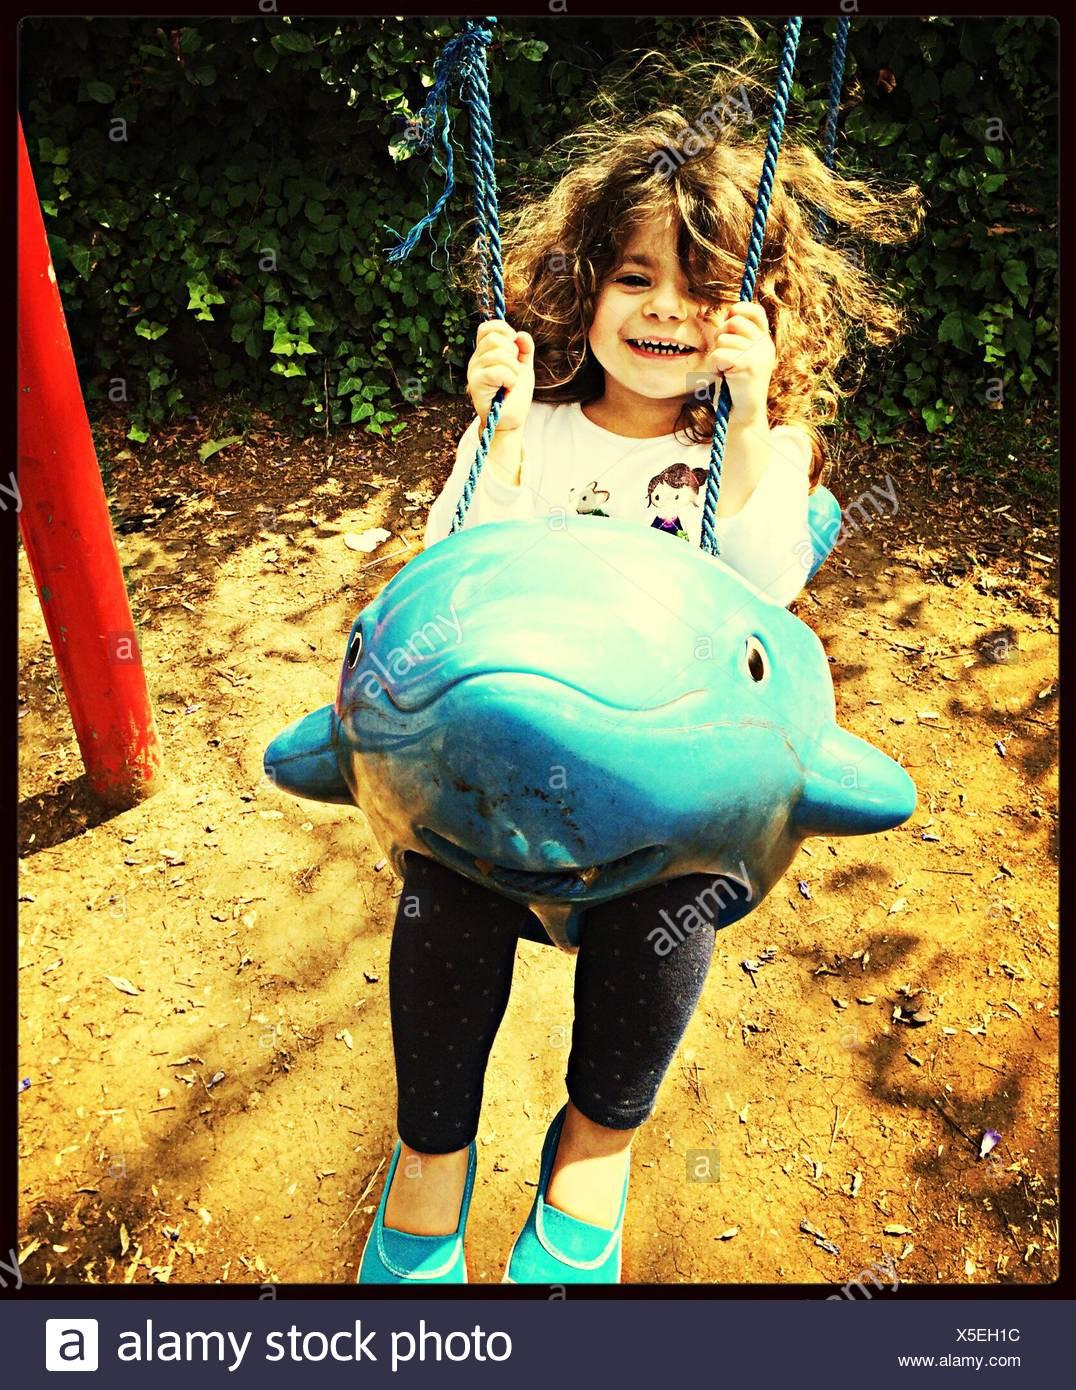 Chica disfrutando de paseo en columpio infantil Imagen De Stock